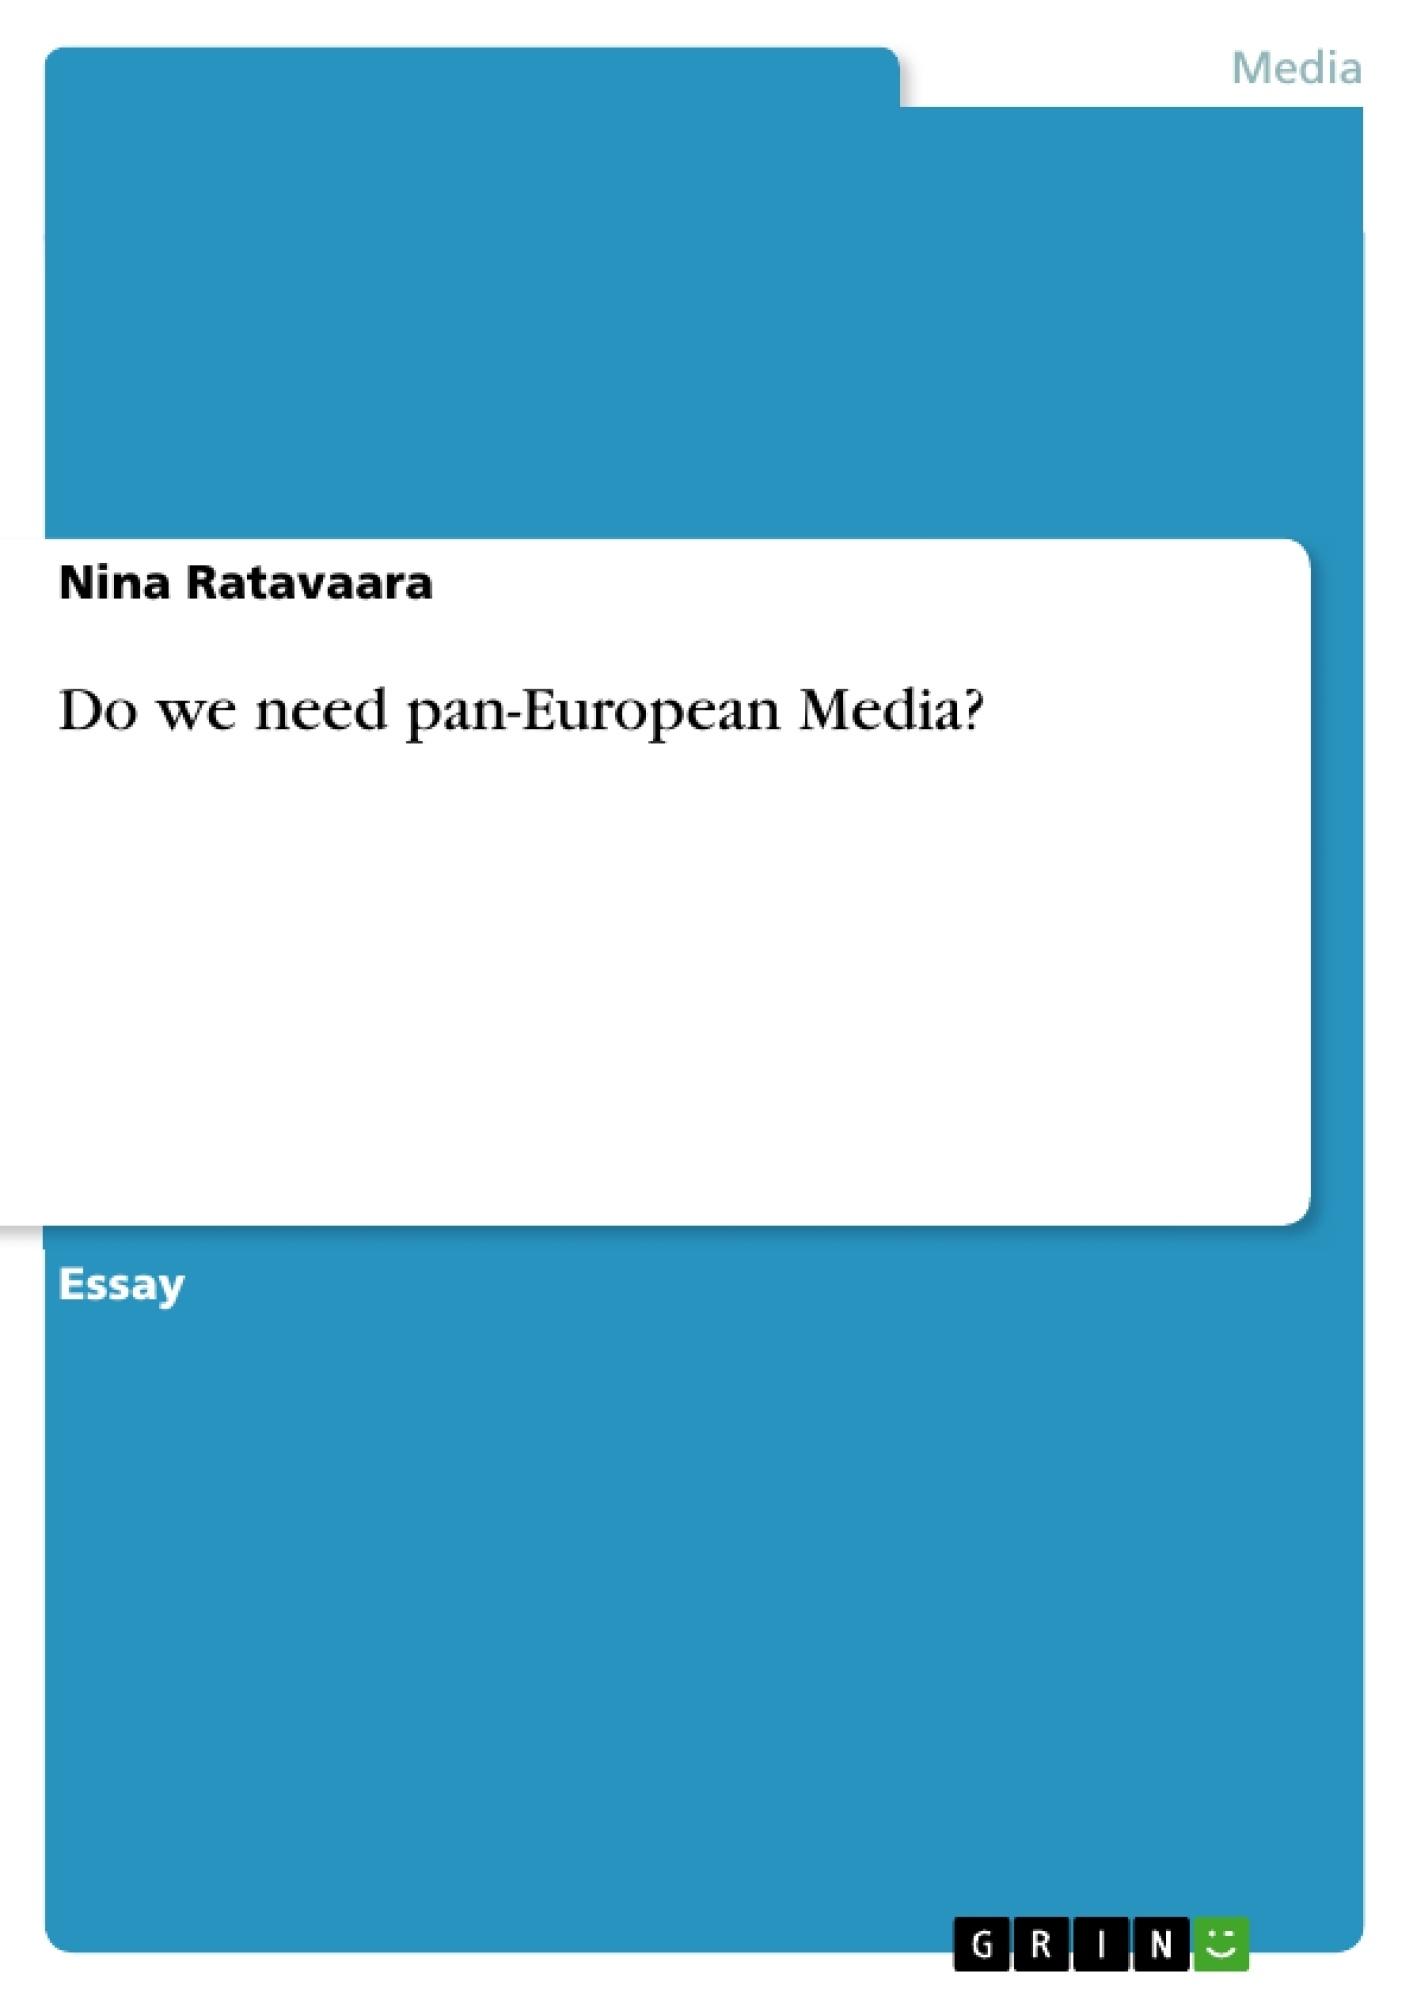 Title: Do we need pan-European Media?